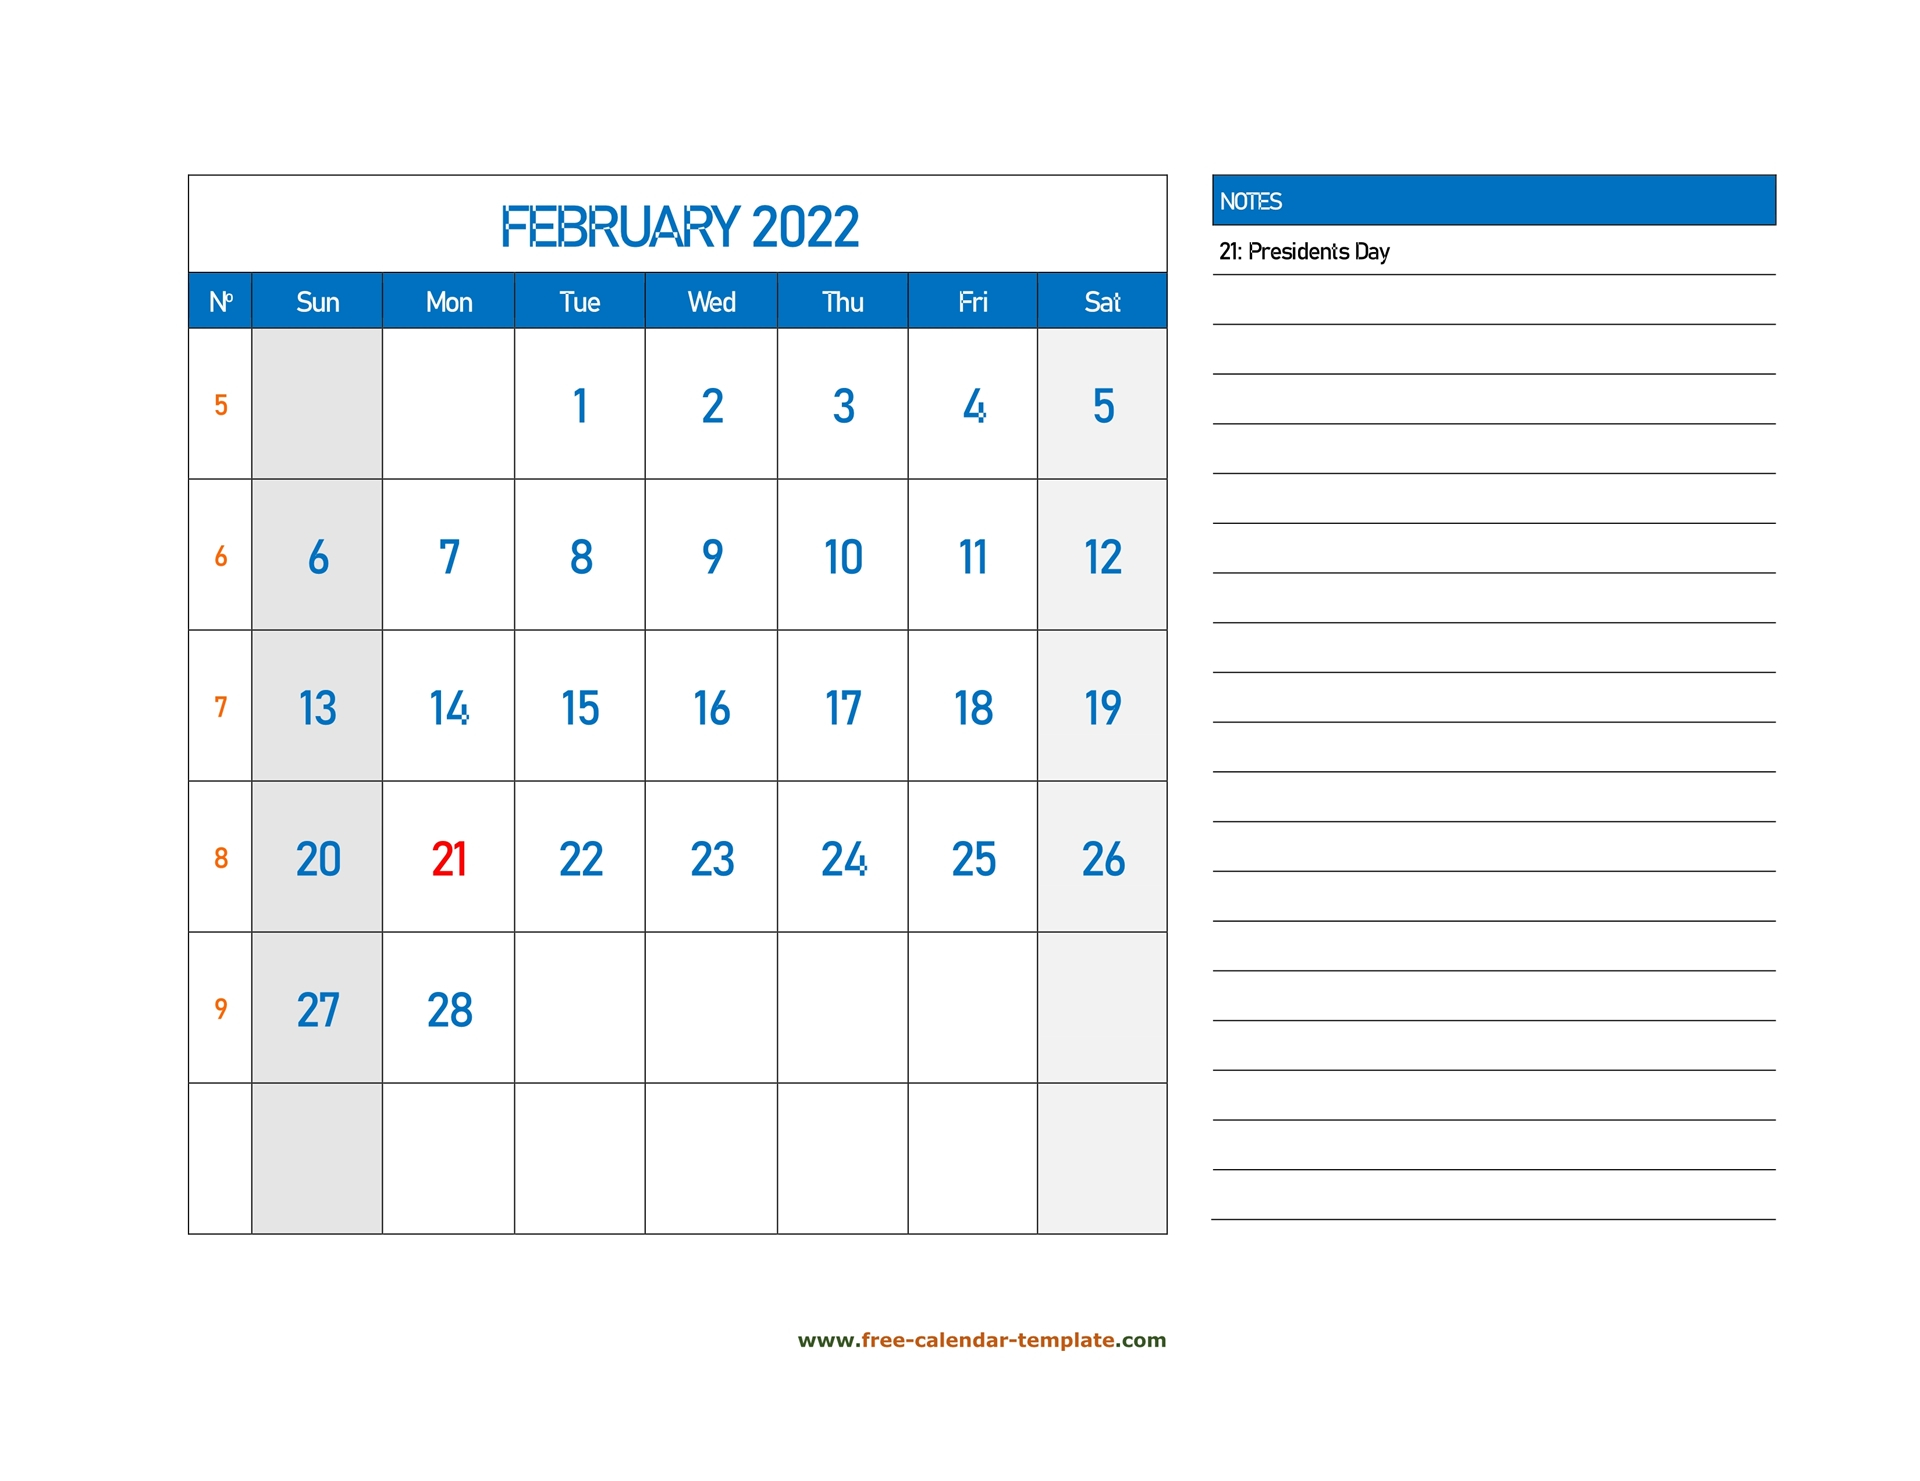 February 2022 Free Calendar Tempplate | Free Calendar Within February 2022 Calendar Template